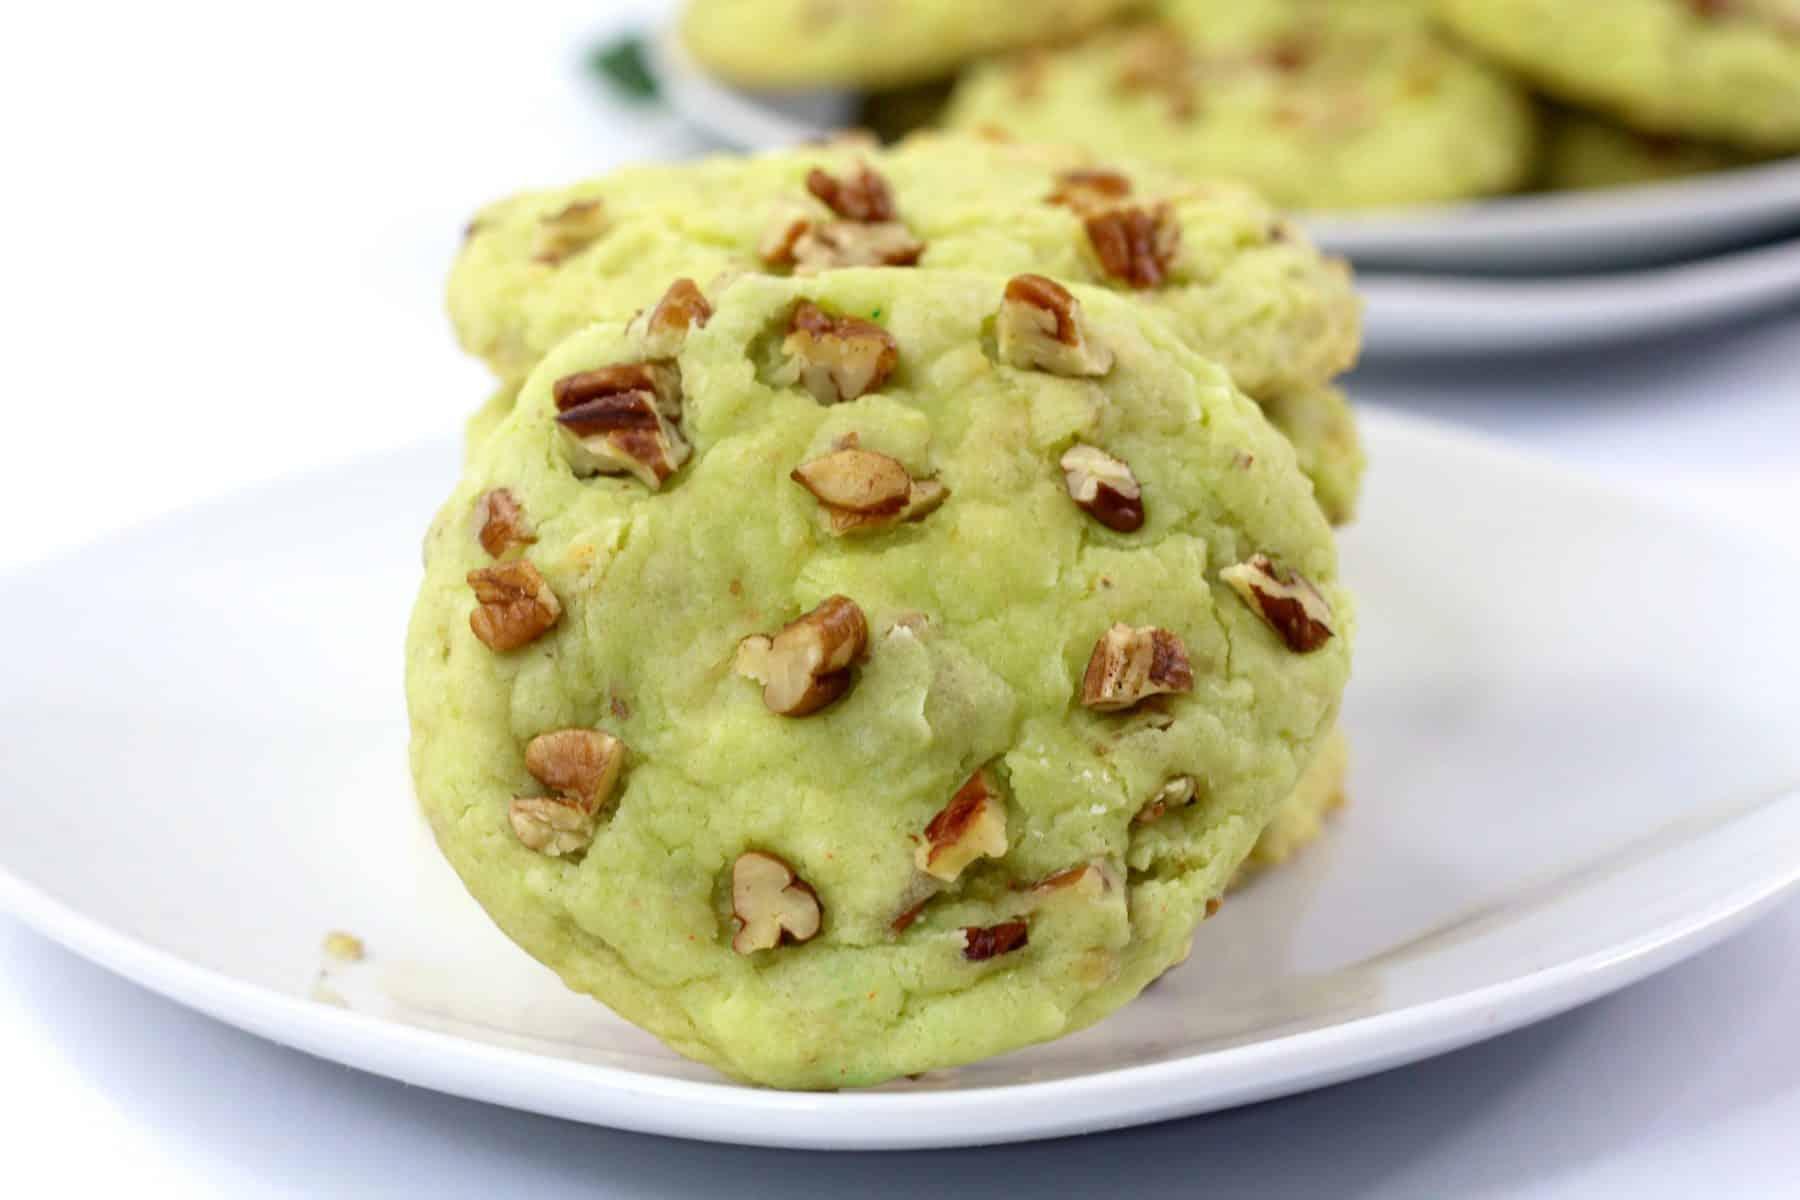 cake mix cookie recipe, easy cake mix watergate cookie recipe